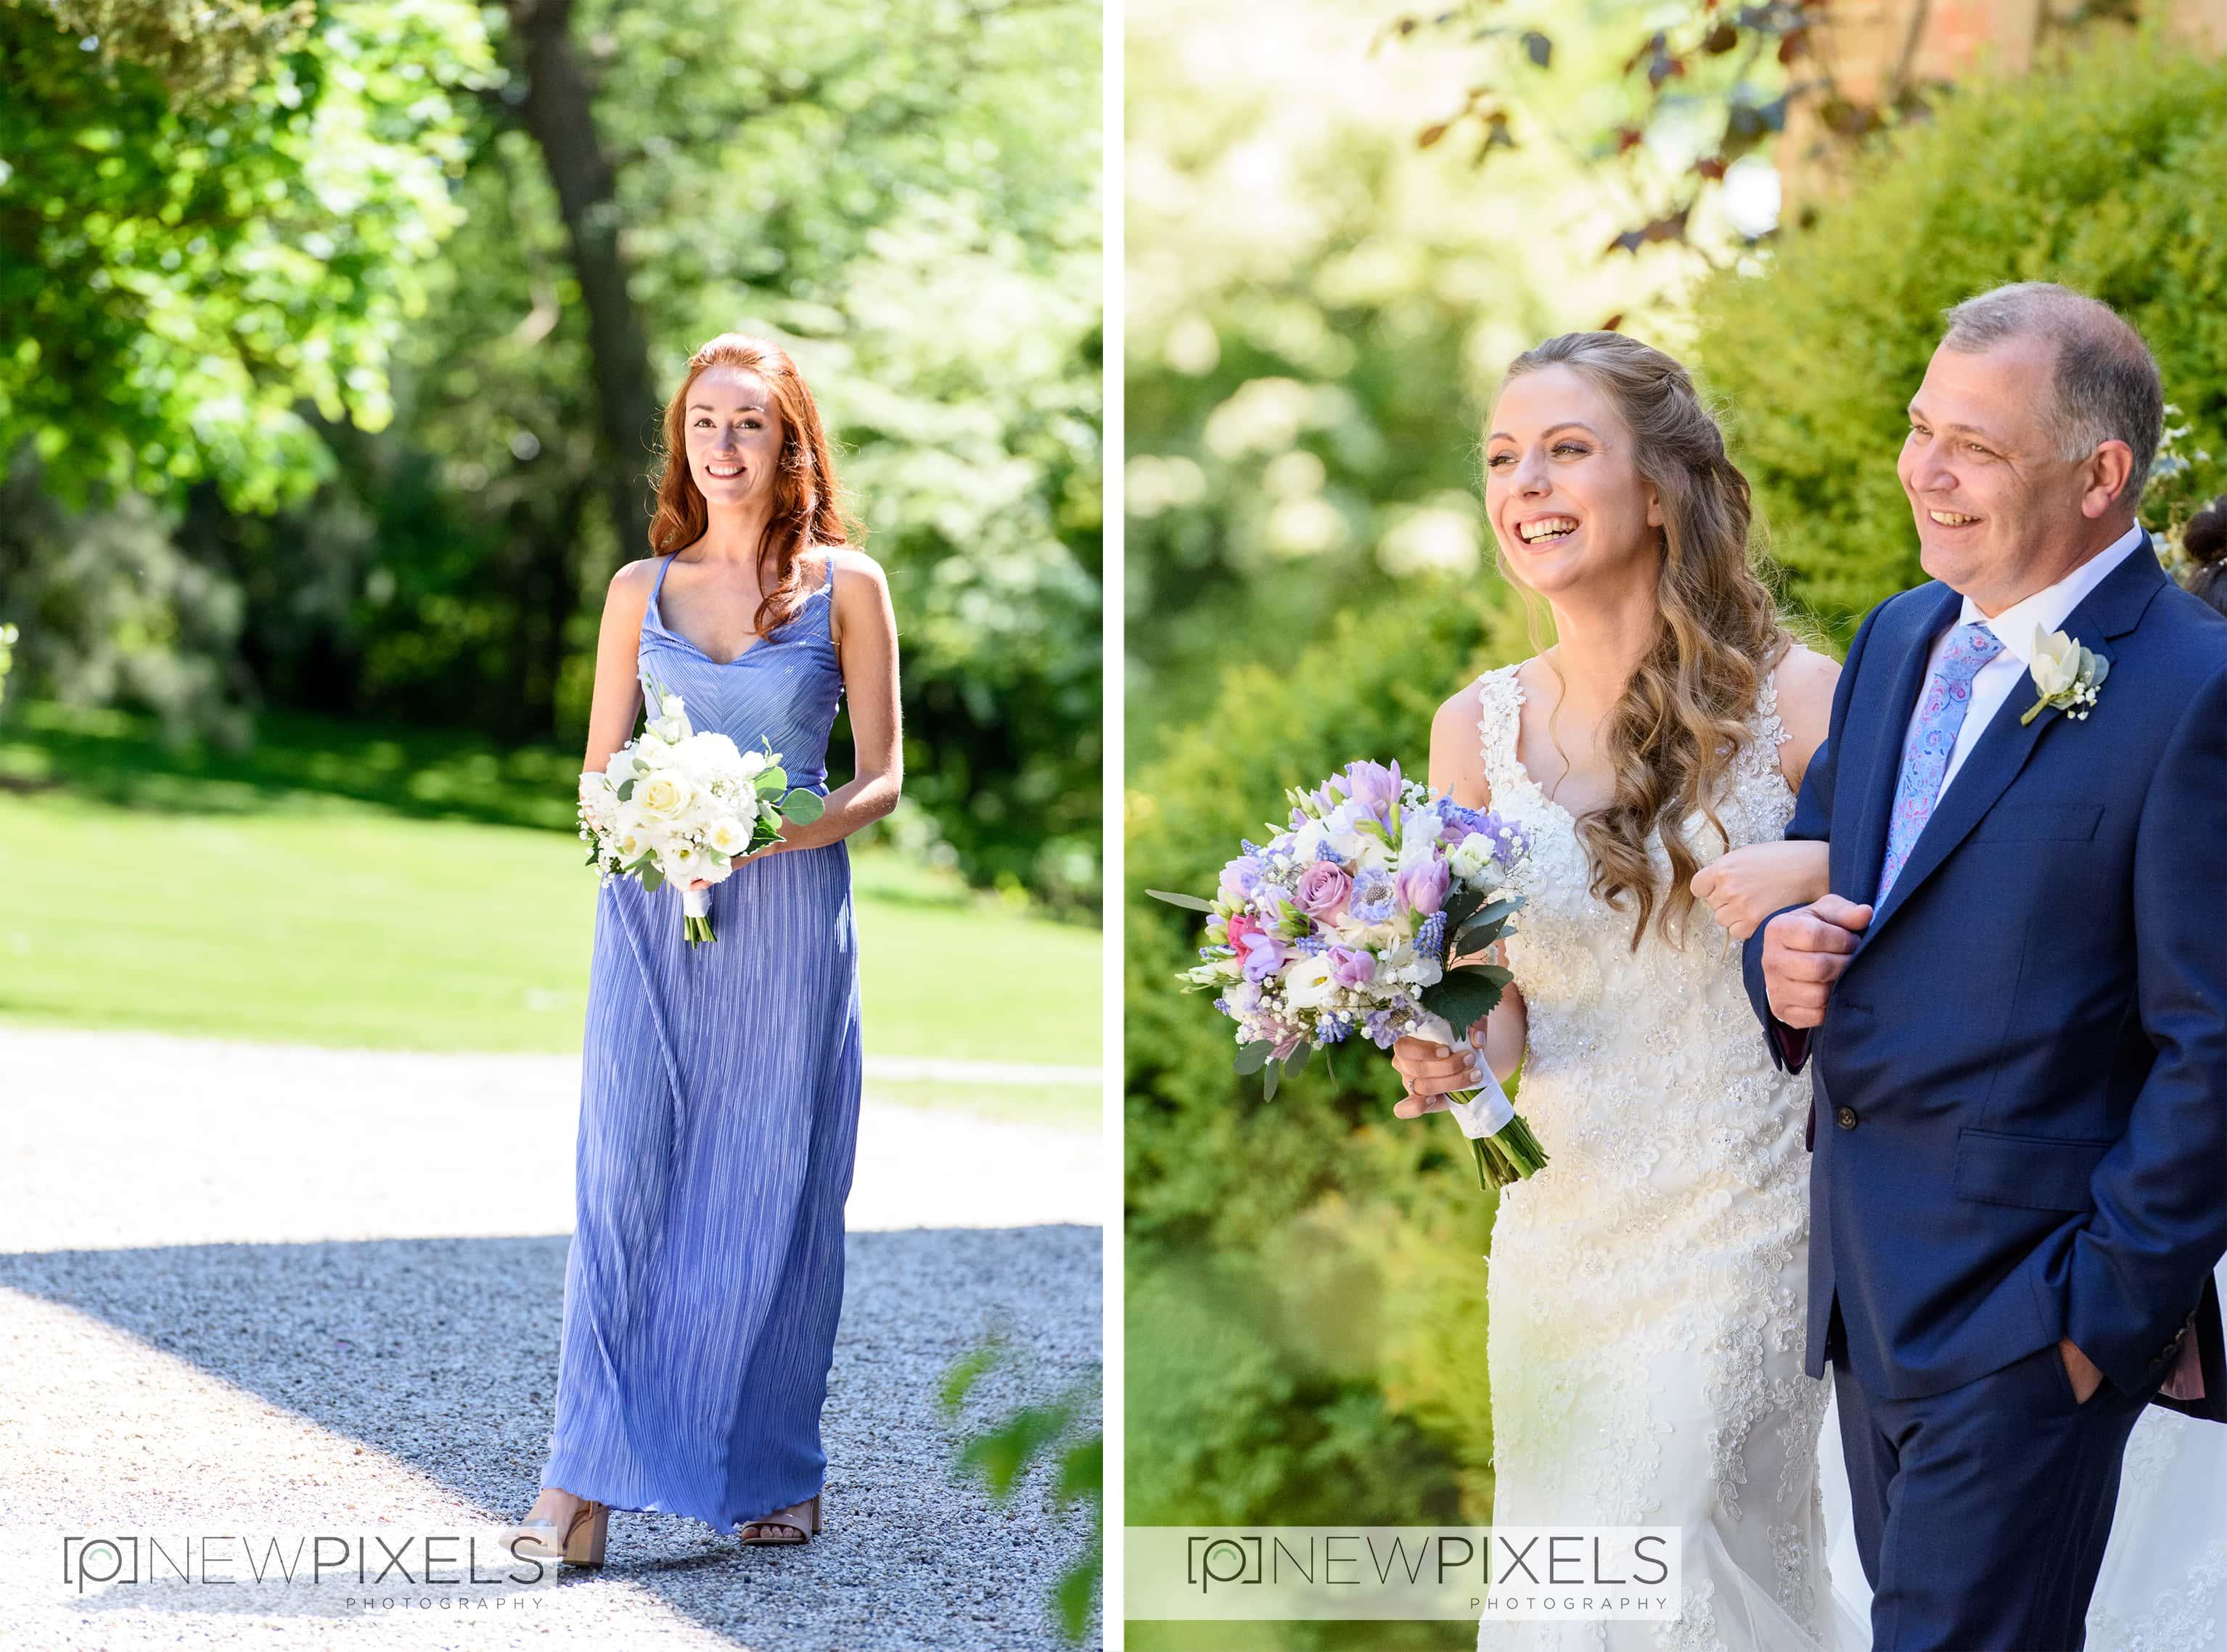 Mulberry House Essex Wedding Photographer92